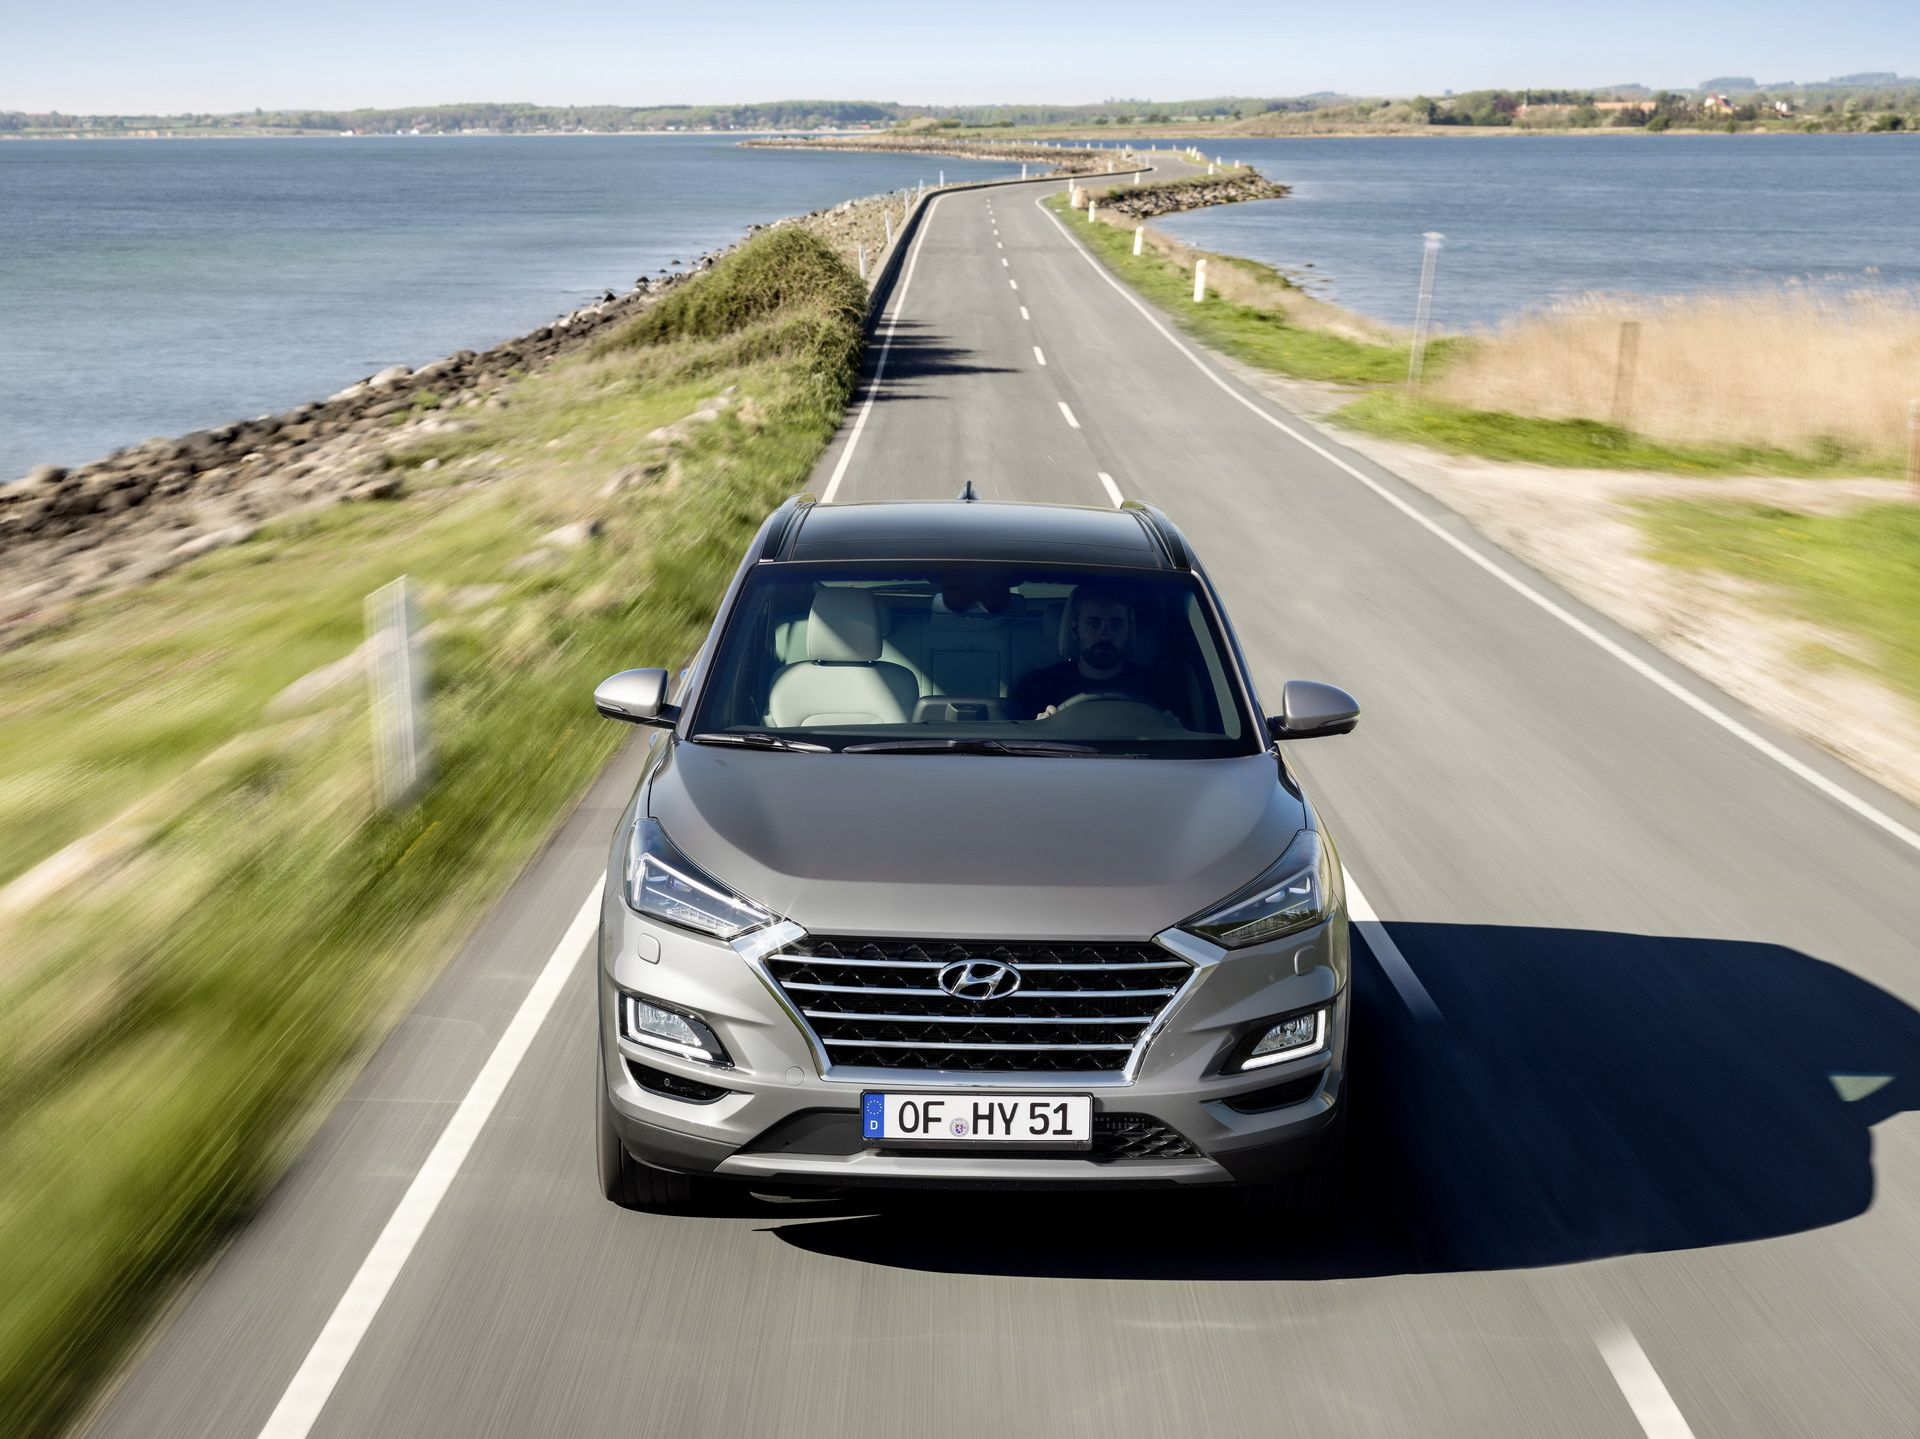 Hyundai-Tucson-2019-xe-sach-va-tiet-kiem-nho-Hybrid-diesel-anh-2